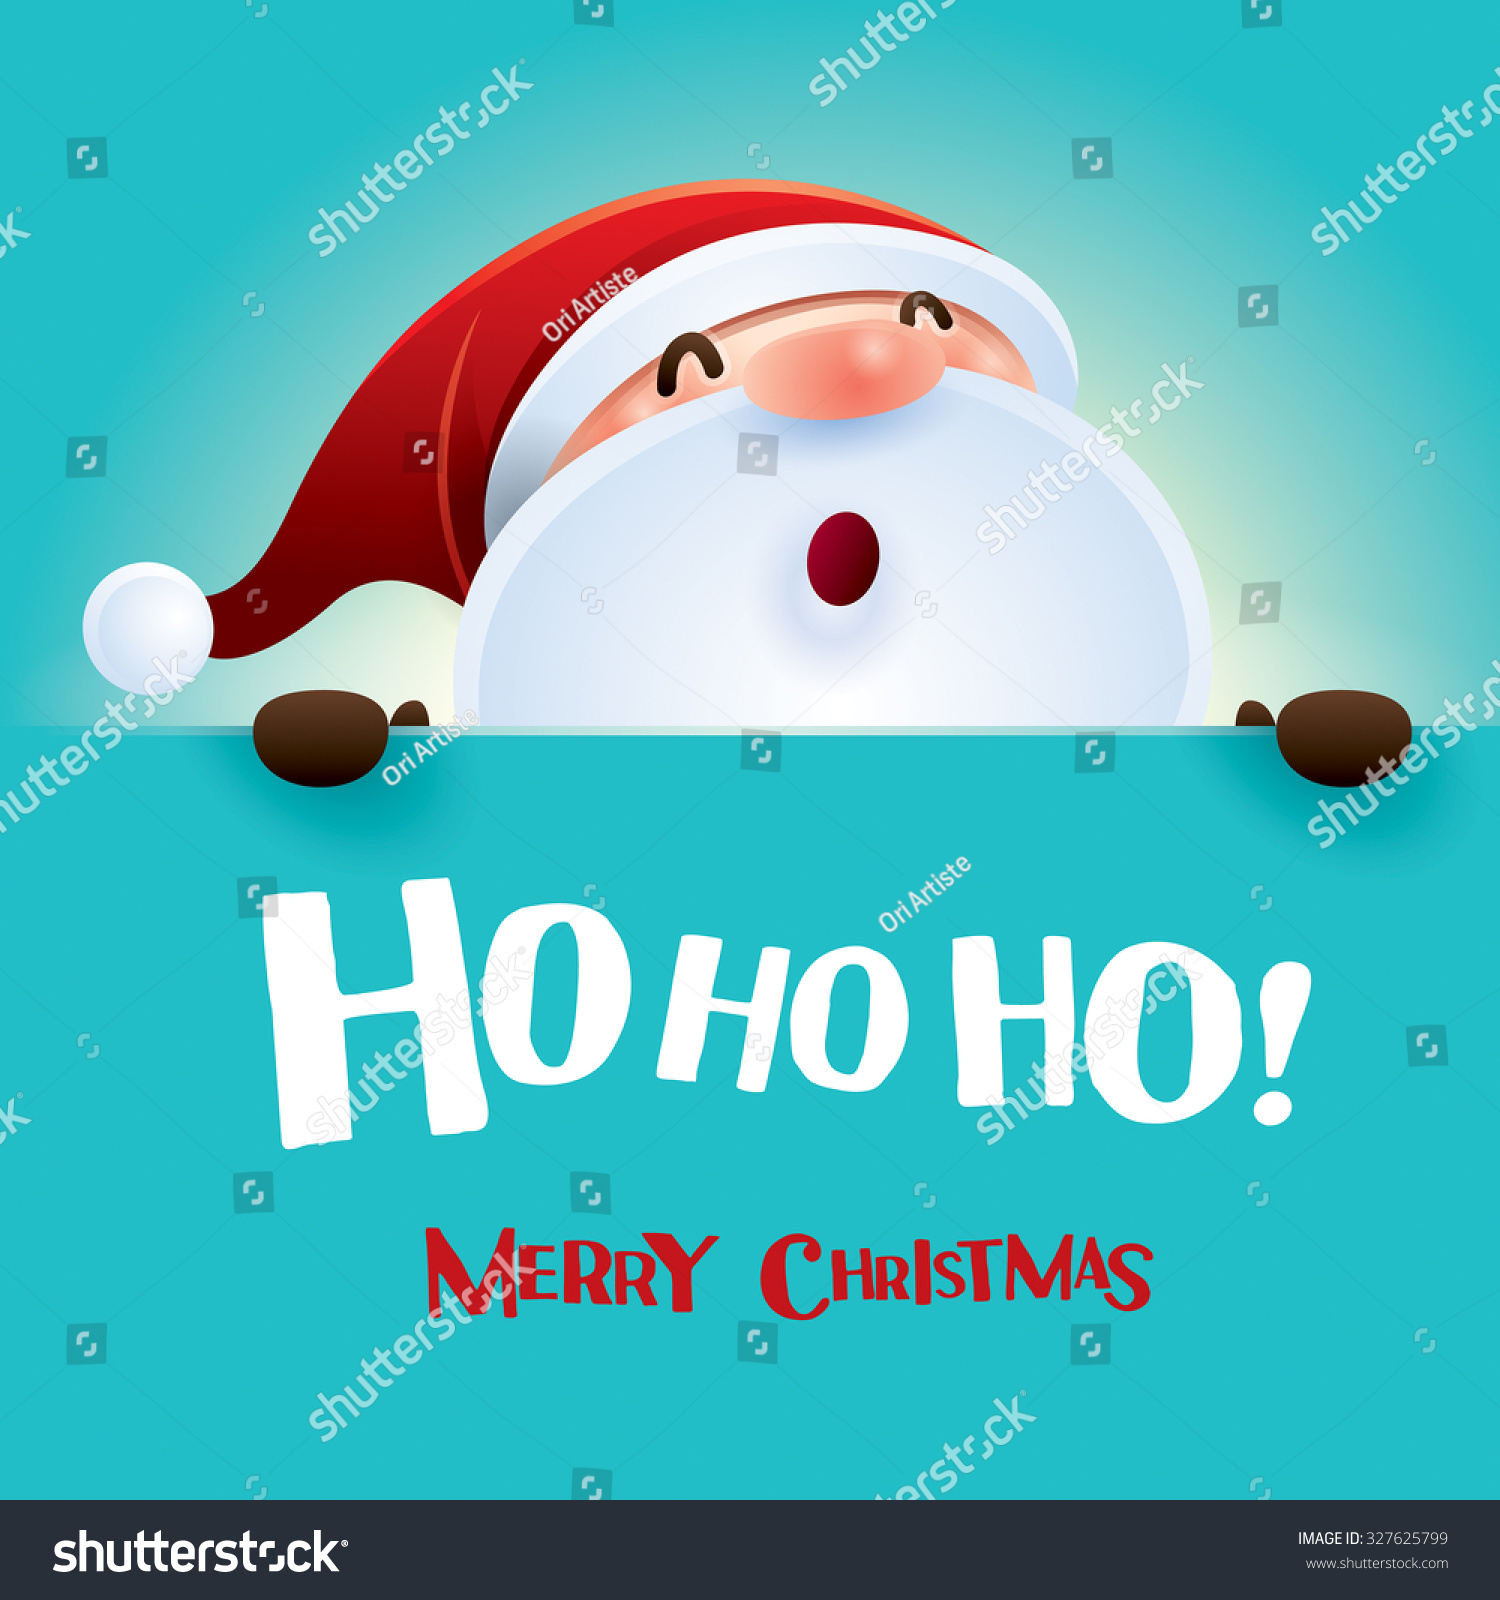 Ho Ho Ho Merry Christmas Stock Vector 327625799 - Shutterstock